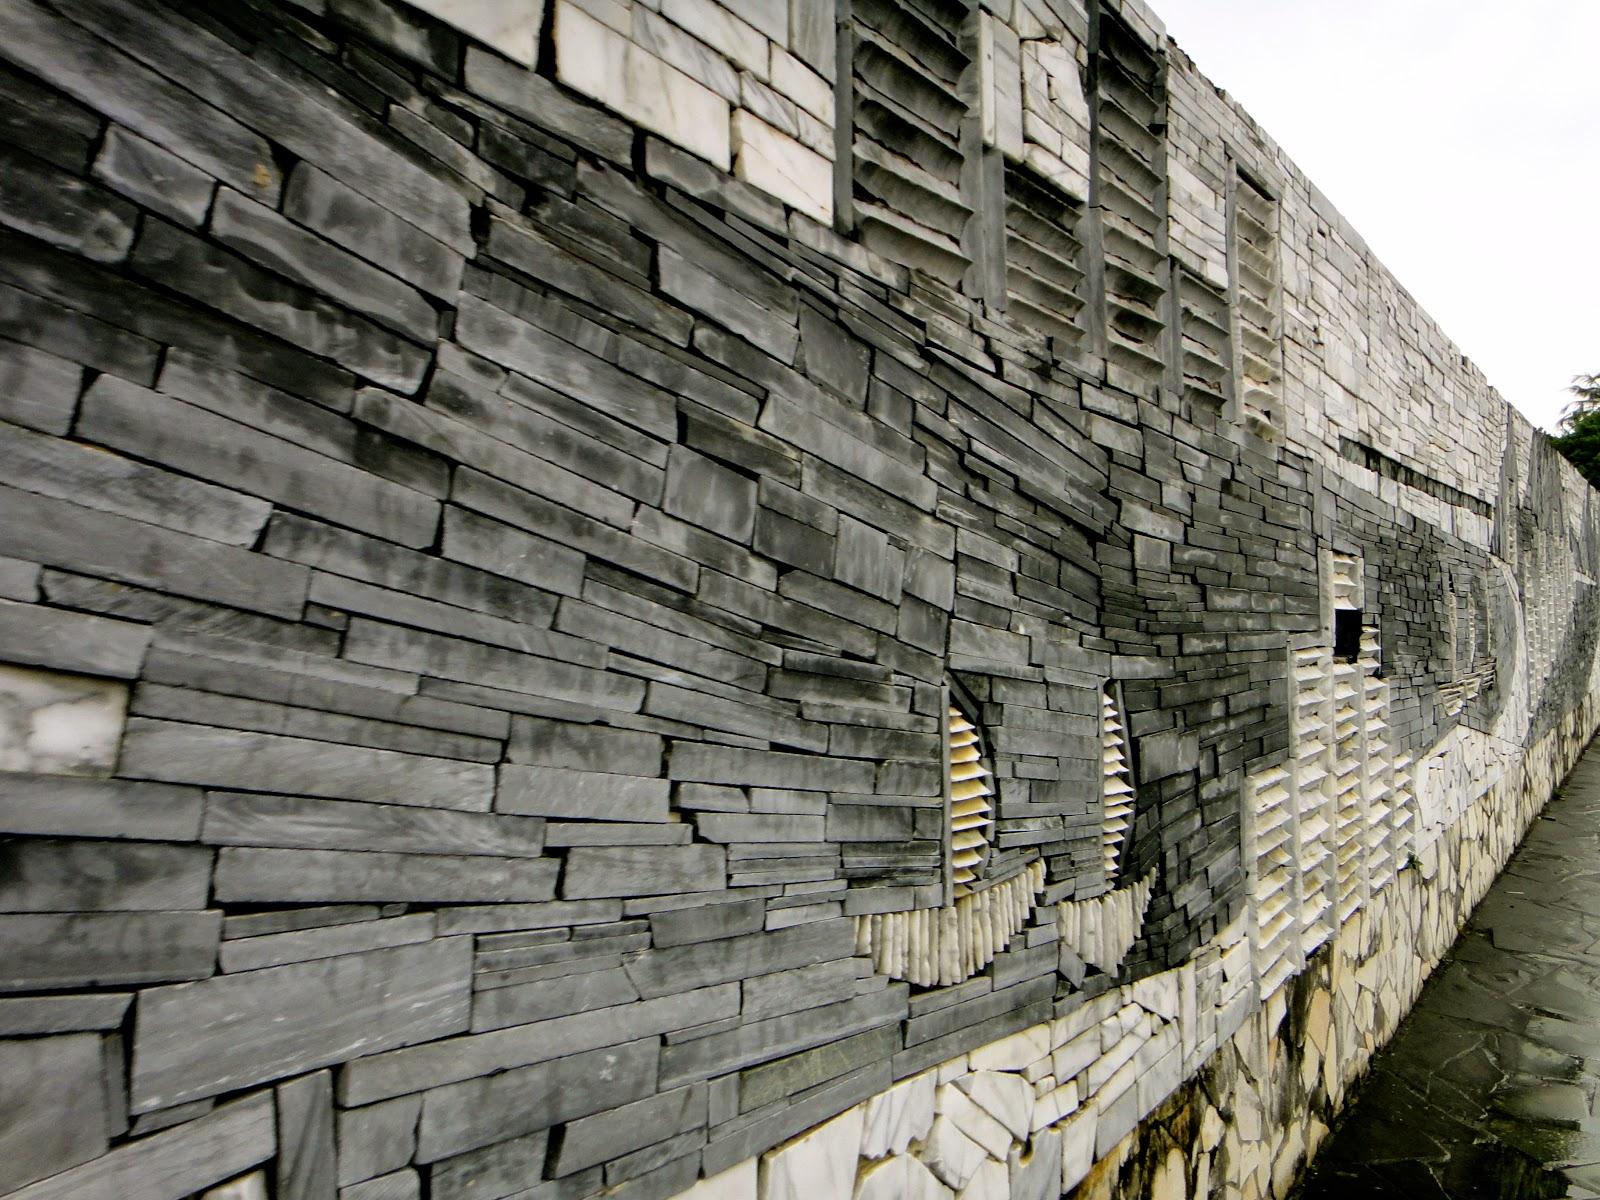 Artistic Wall in Hualien